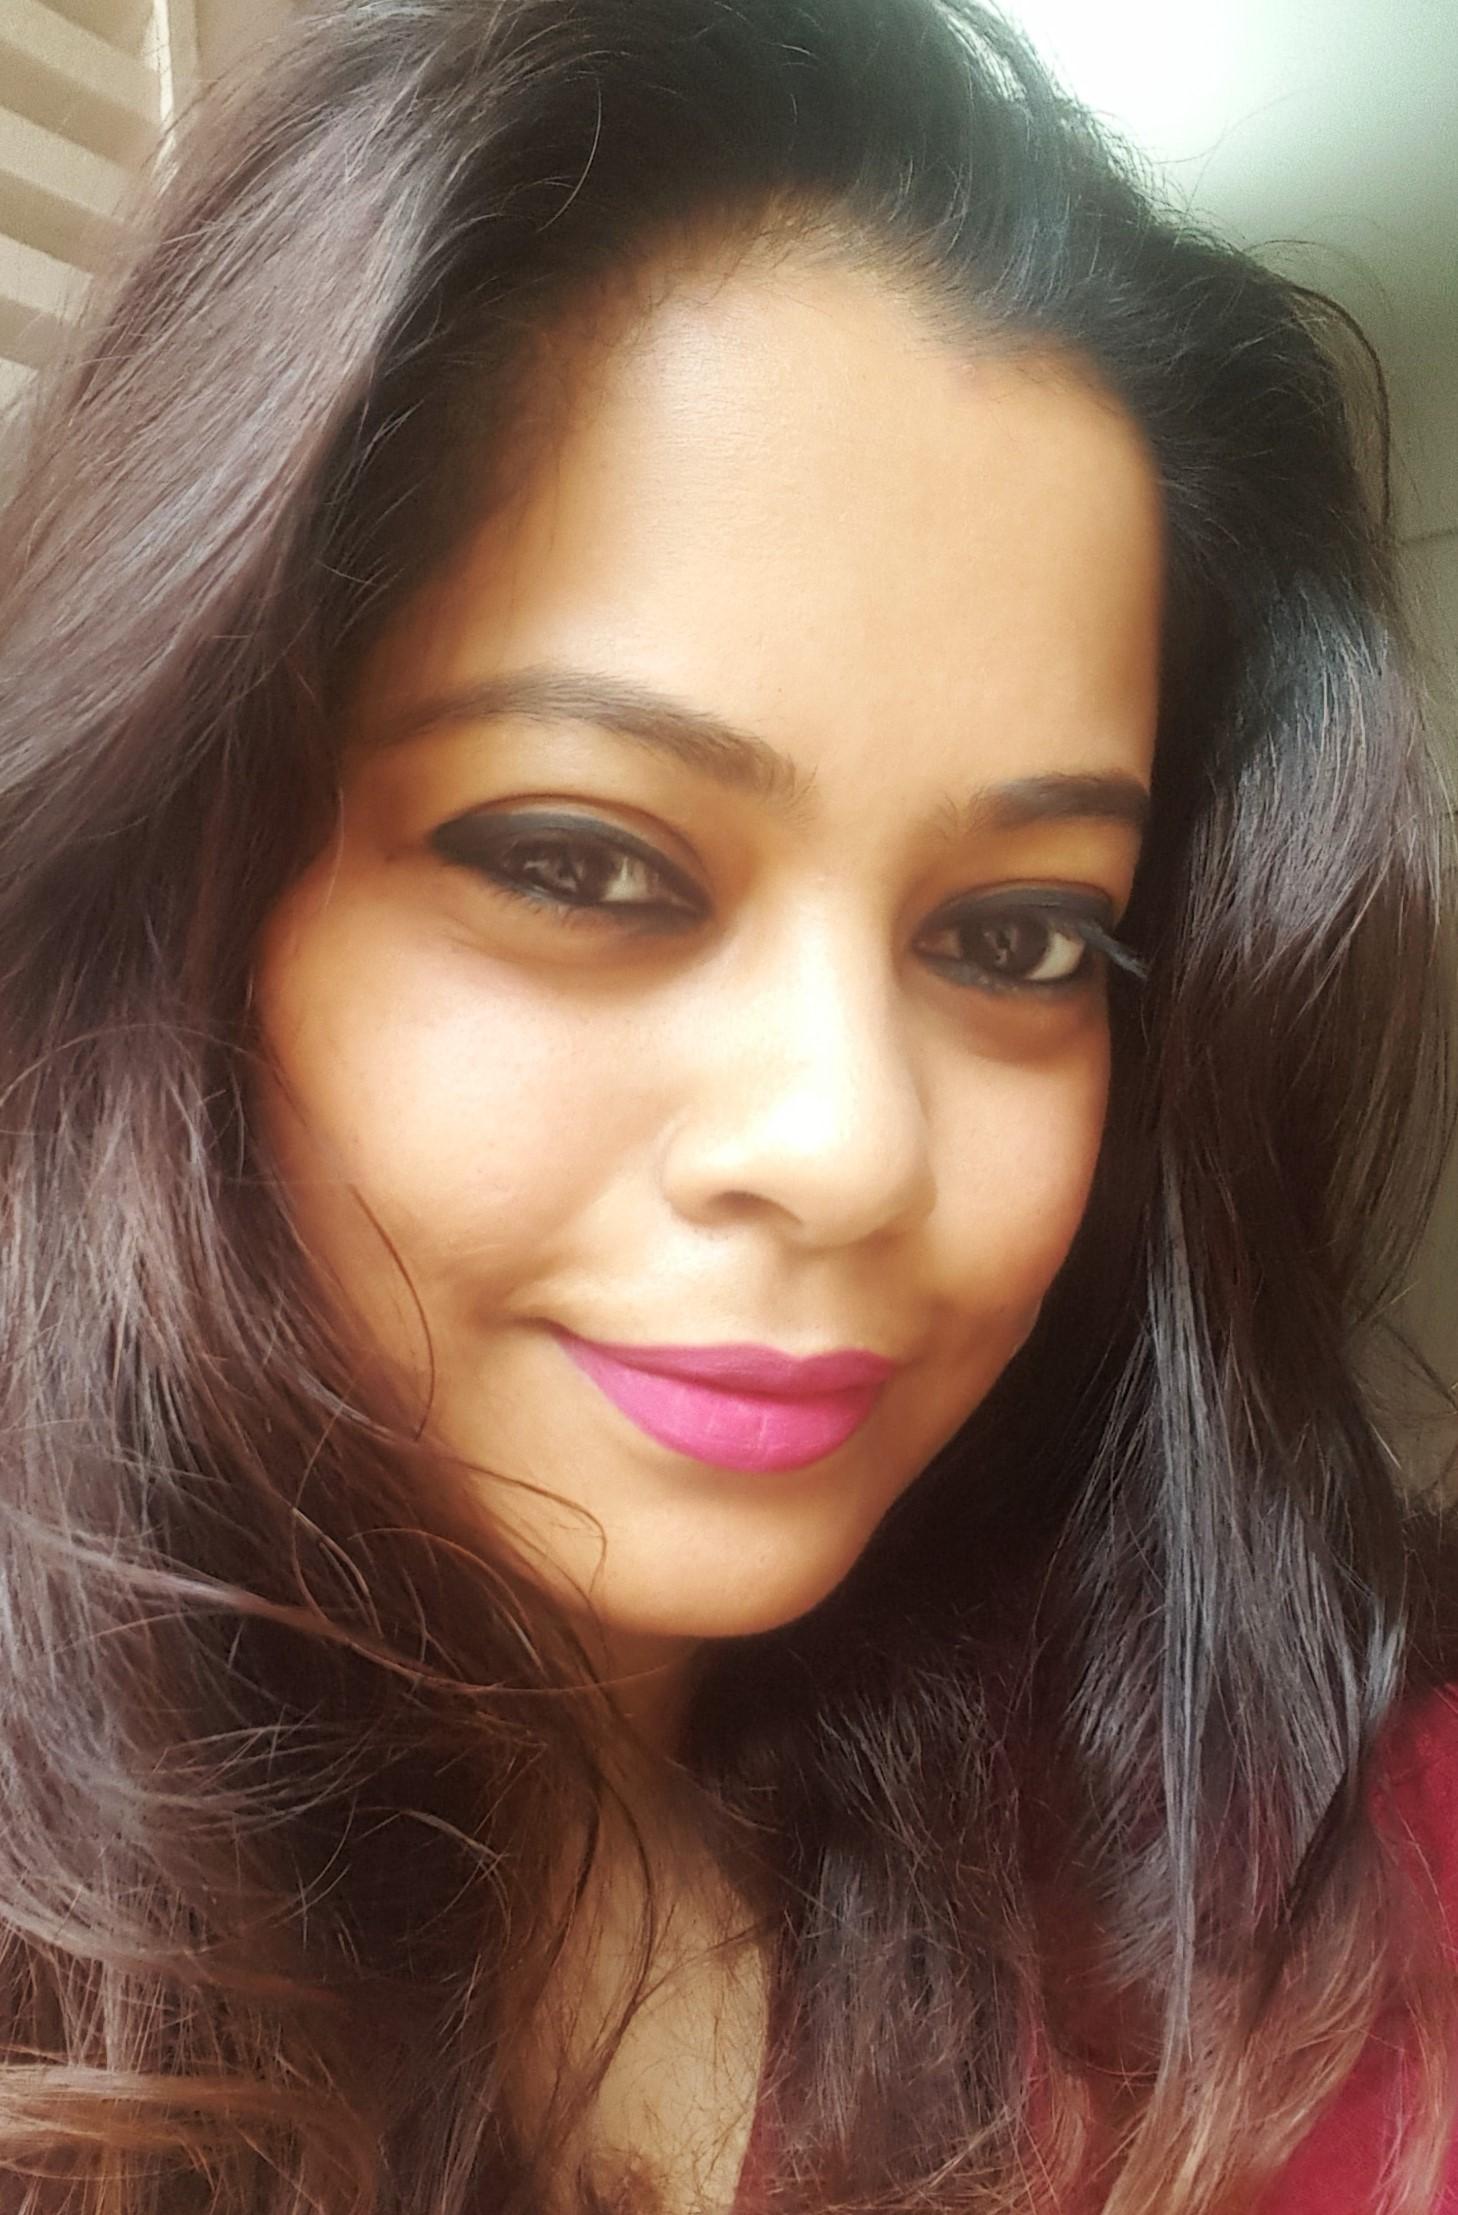 Colourpop Blotted Lip Vs Glossier Generation G Lipstick: Four ColourPop Ultra Blotted Lip Shades